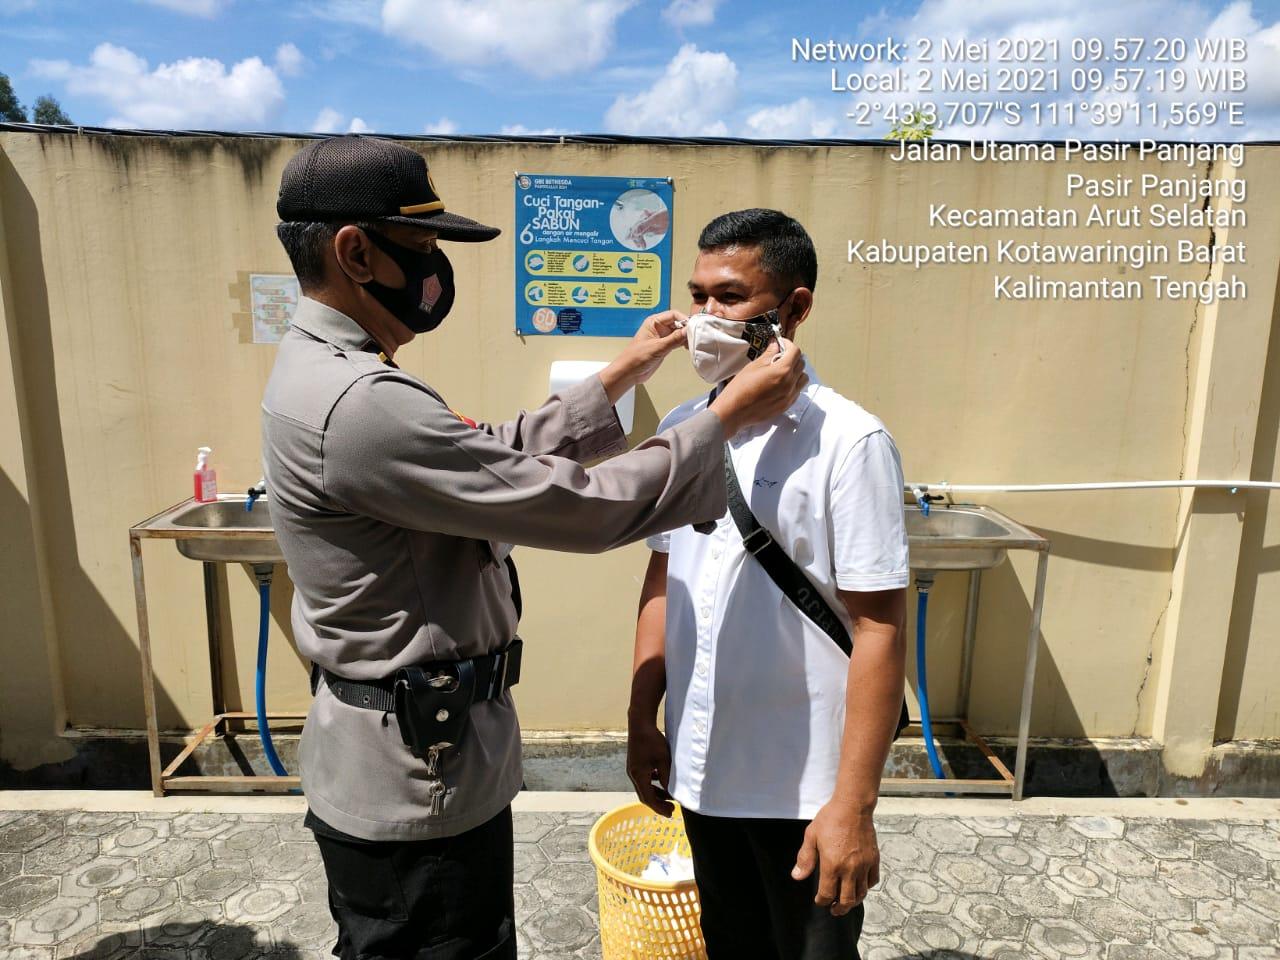 Polsek Arsel Bersama TNI Menghibau Warga Pakai Masker